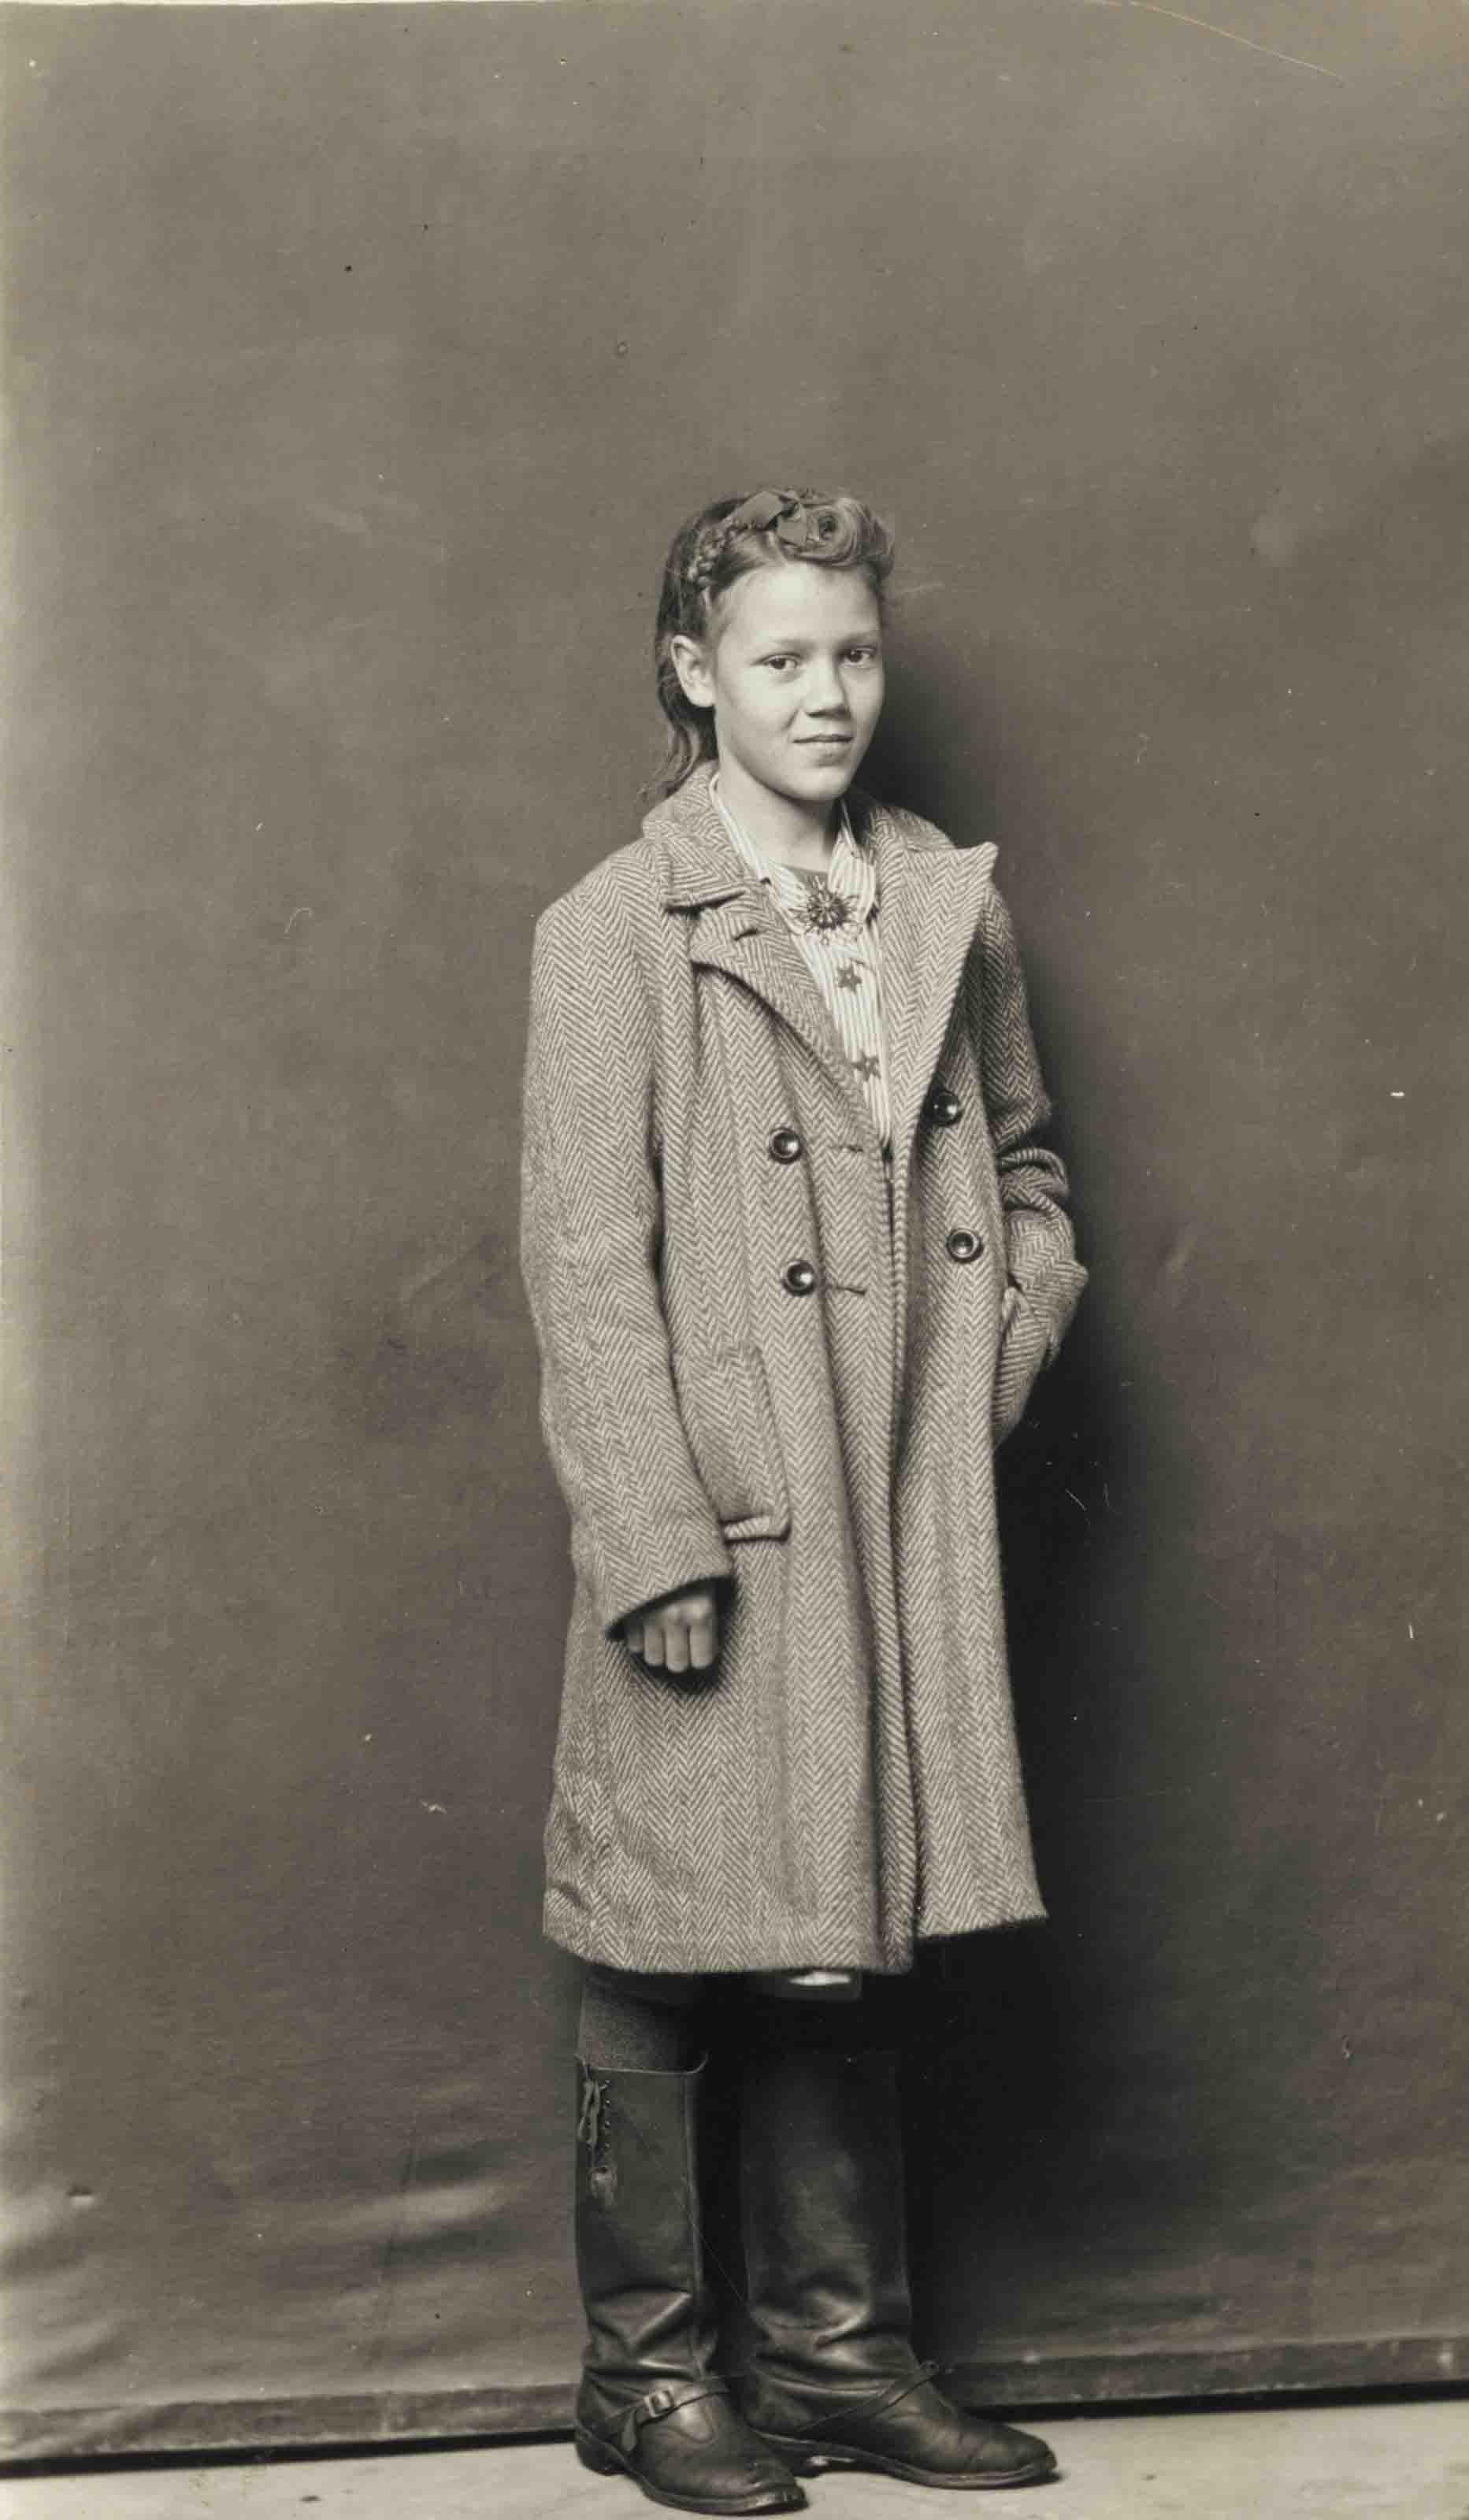 Heber Springs, Arkansas c. 1940-1945